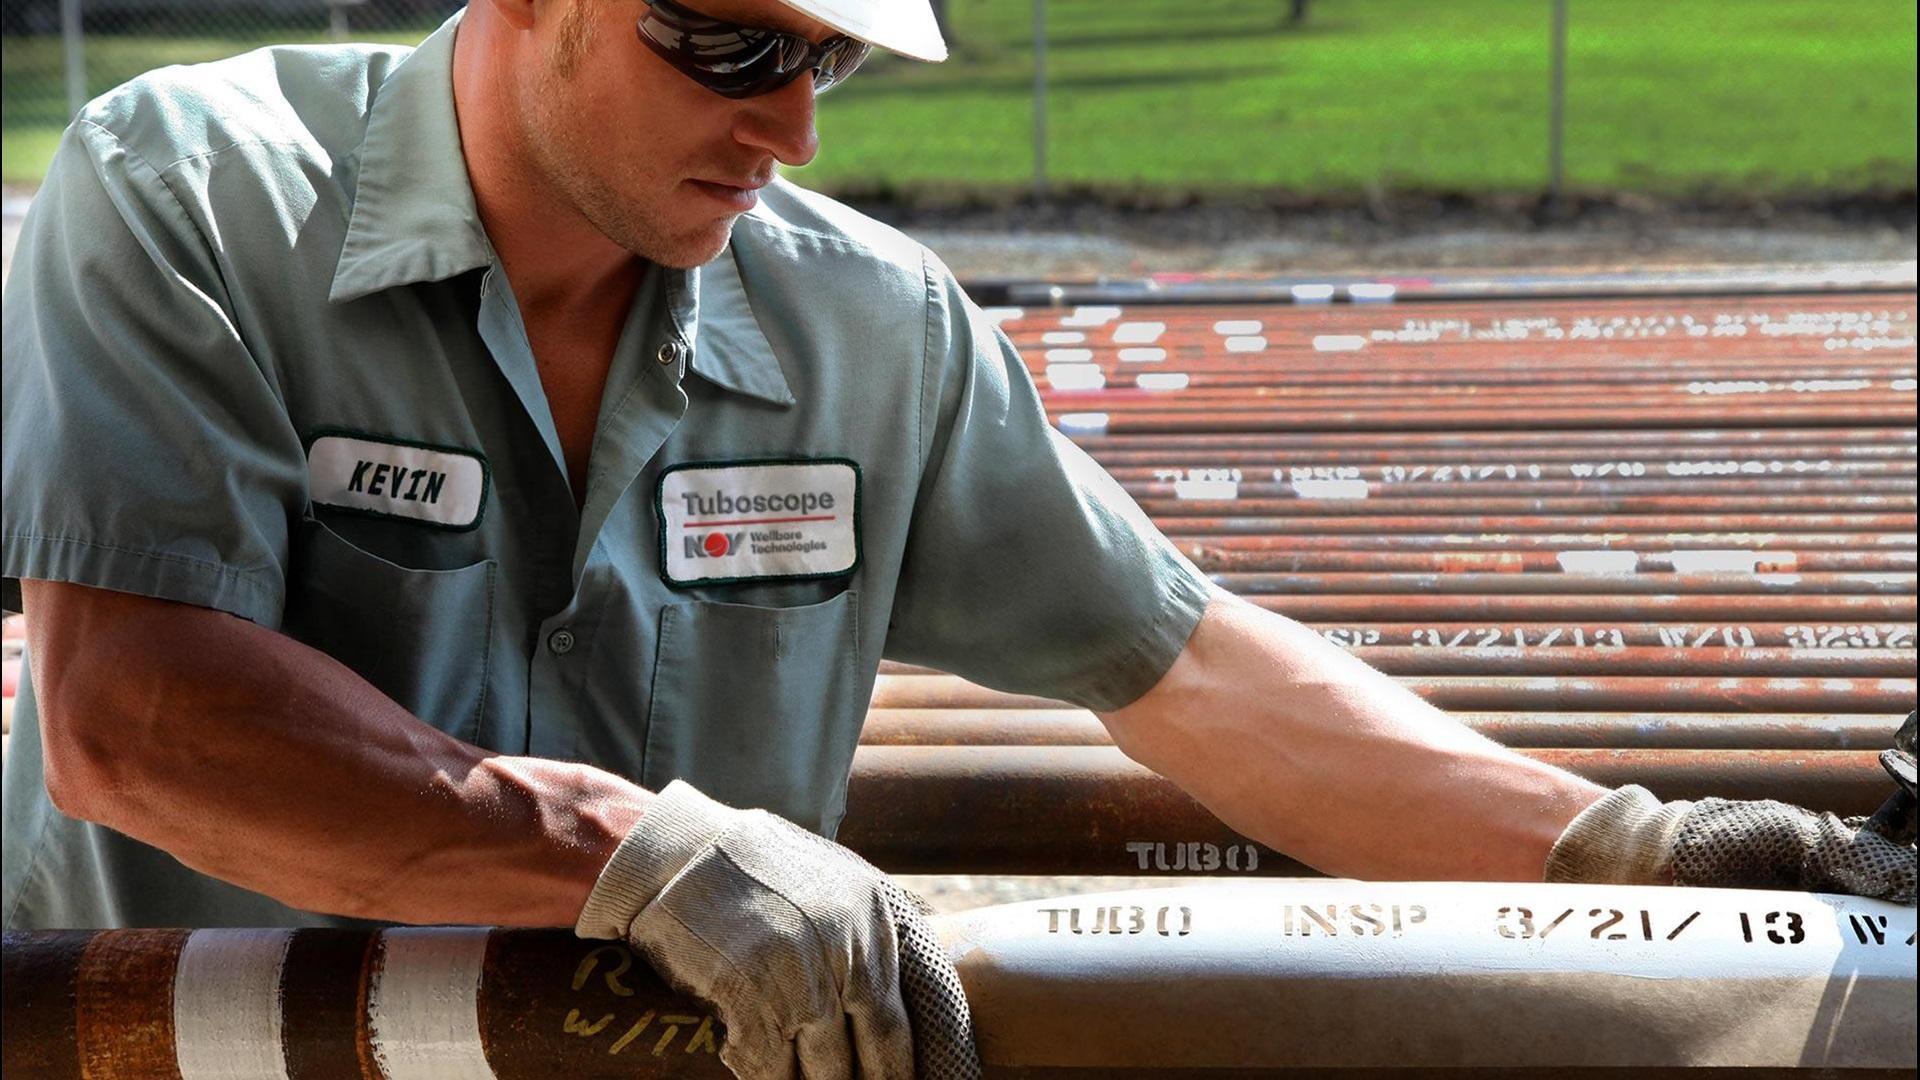 Image of an NOV employee applying a Tuboscope stencil to tubing.